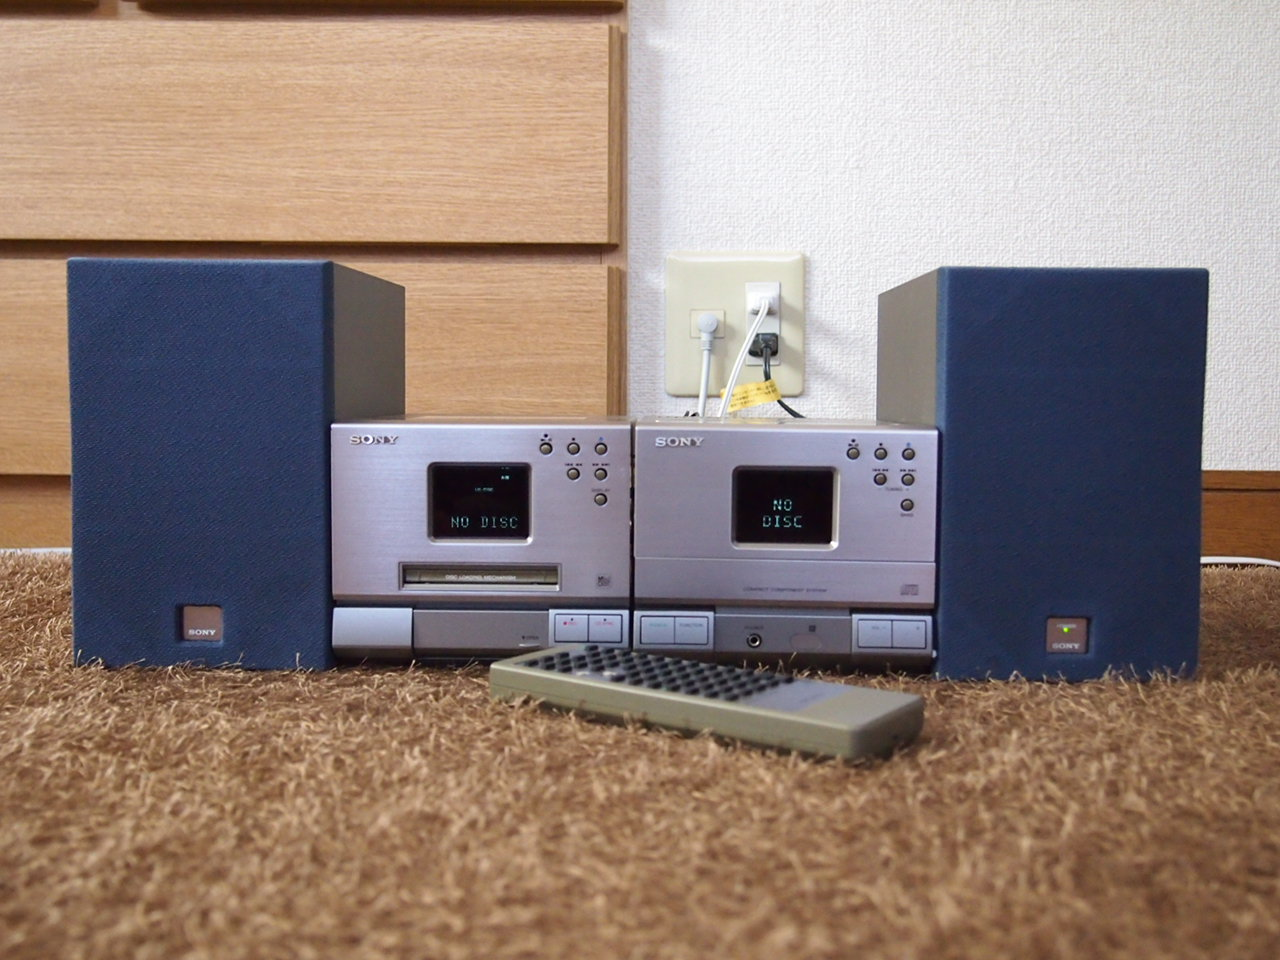 SONY Qbric CMT-M1 - SALTAWAY